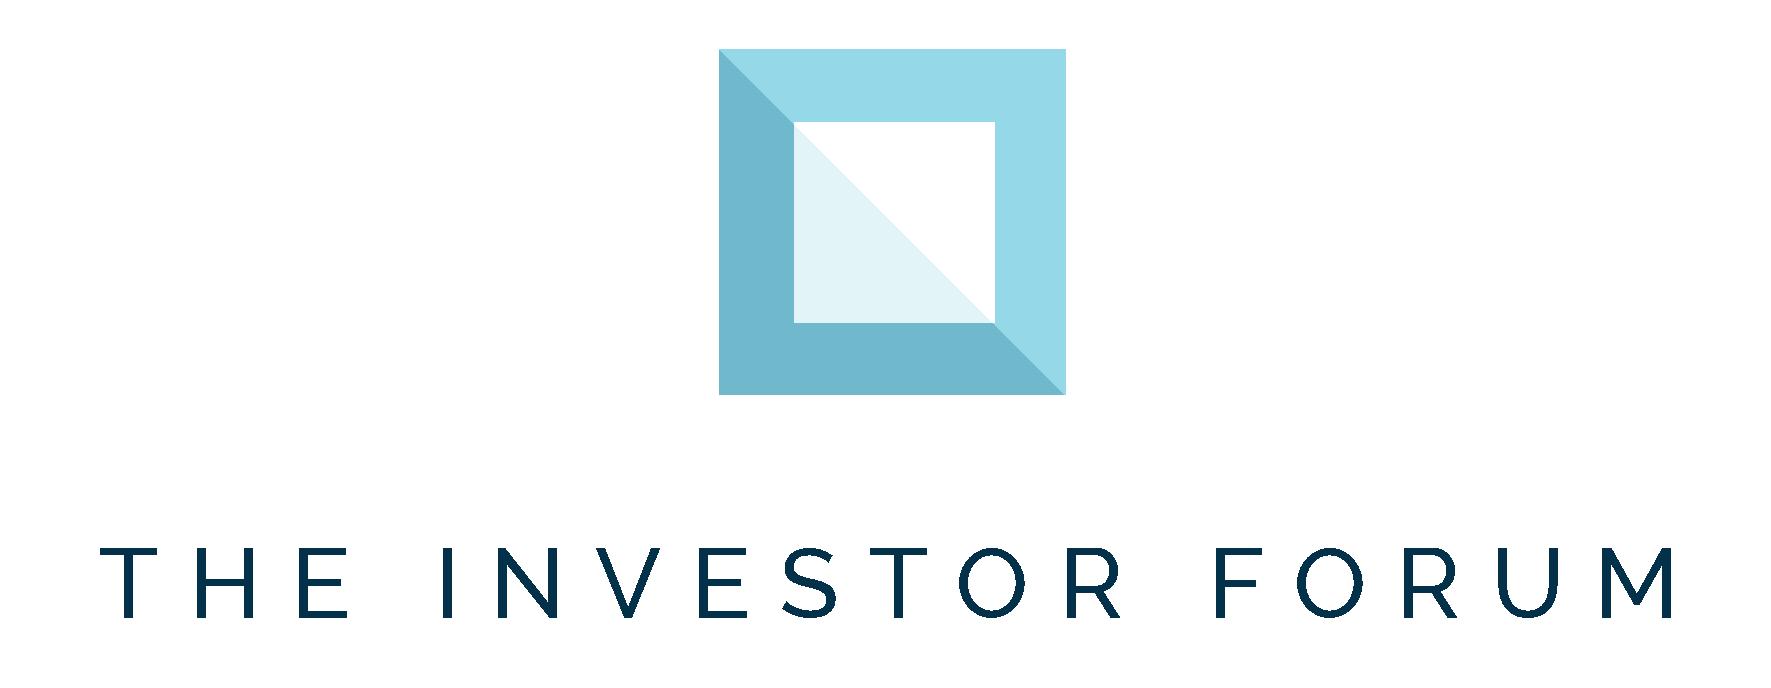 Investor Forum Logo - JPEG